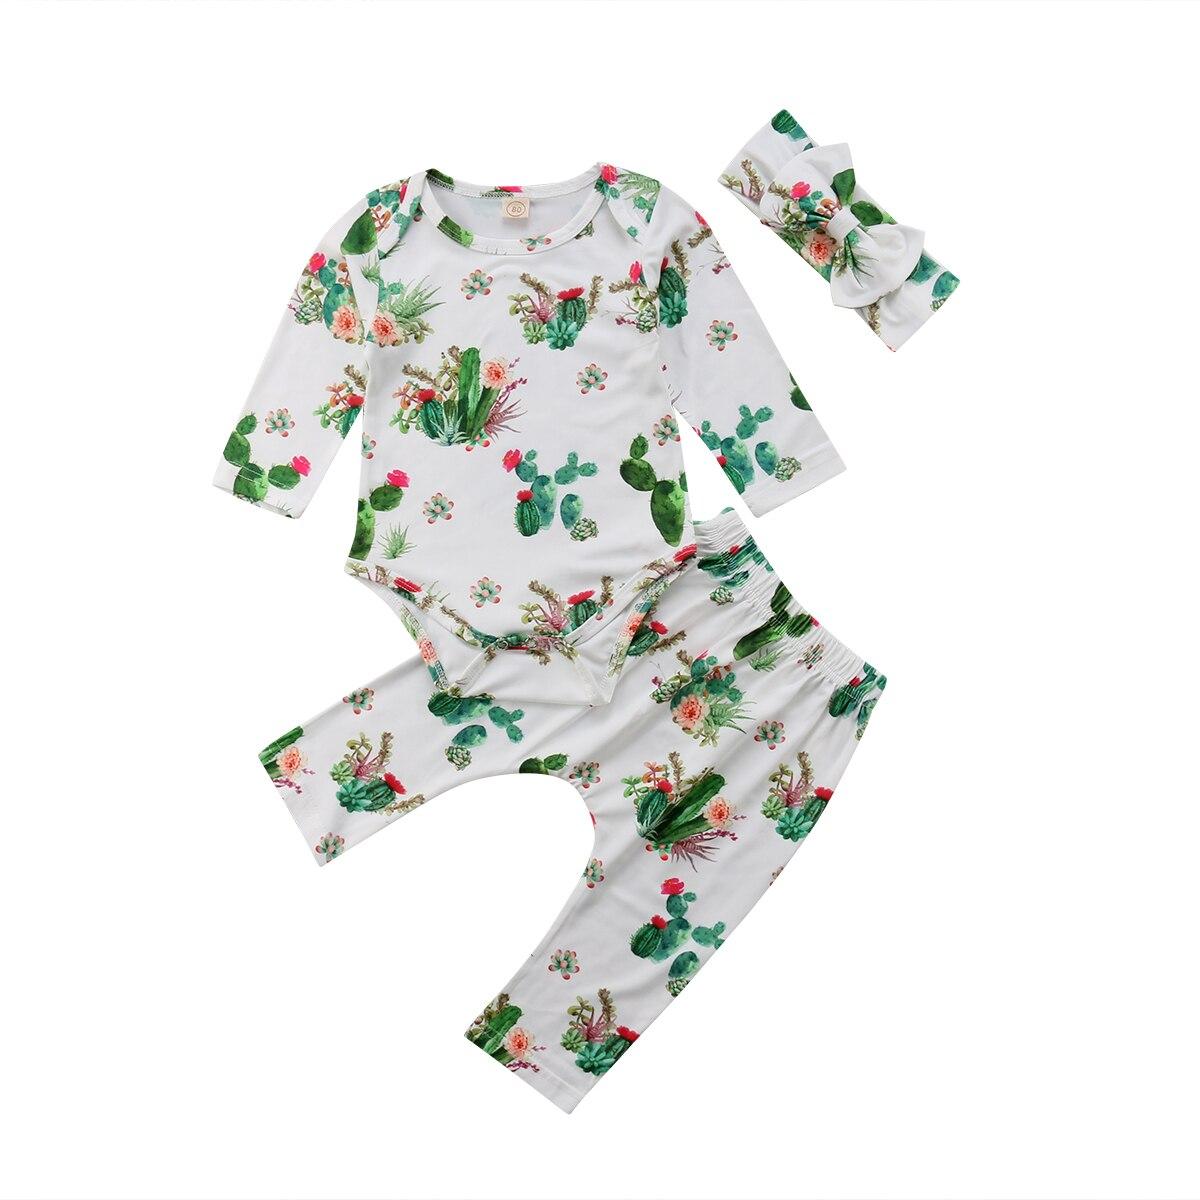 2018 Newborn Infant kids Baby Girl Boy Cactus Print Clothing Set Long Sleeves Romper Bodysuit + Pants+Headband 3pcs Outfits